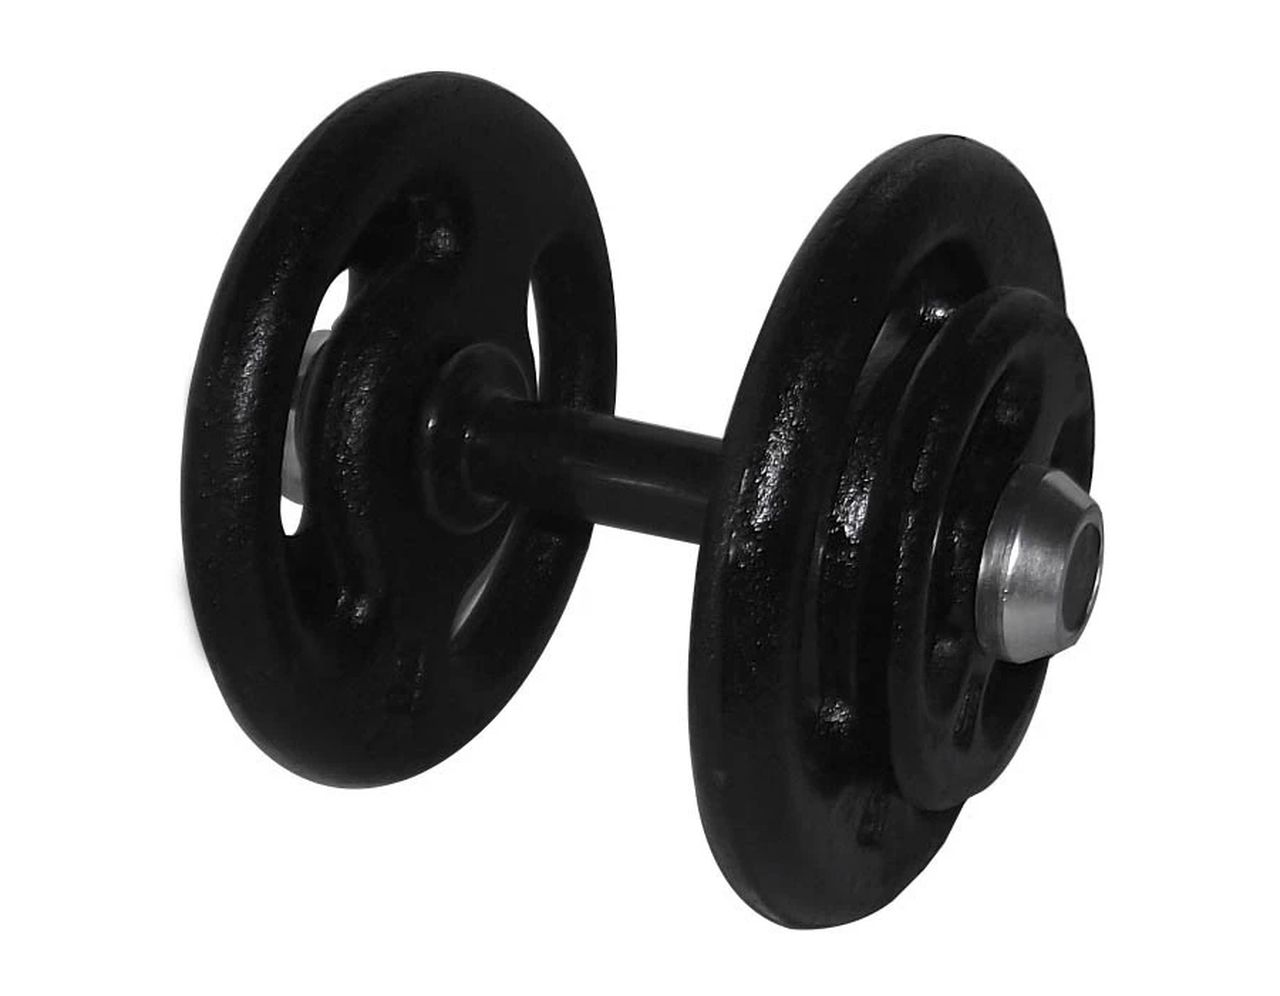 Dumbbell Pintado Pegada Emborrachada Academia Fitness 22kg  - Panela de Ferro Fundido